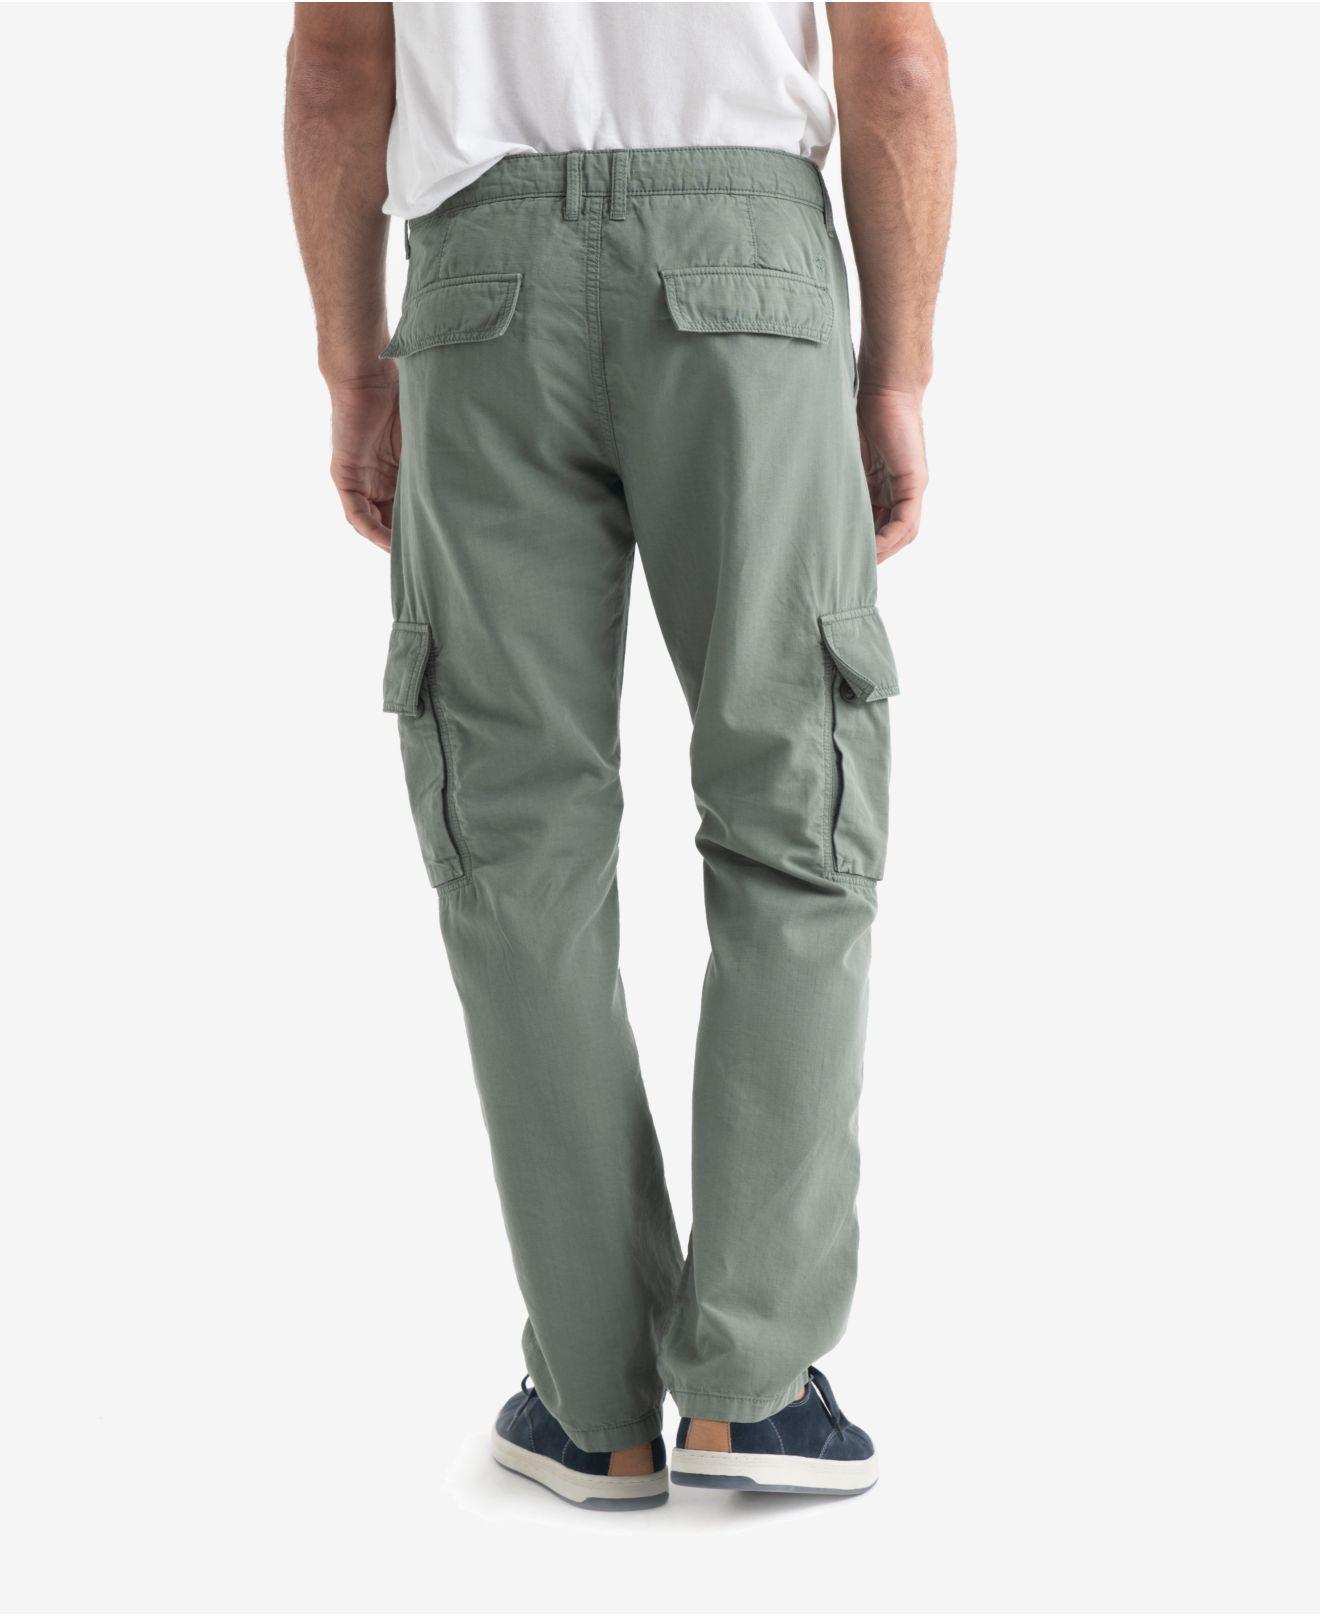 da4e3710 Mens Ripstop Cargo Dress Pants | Saddha